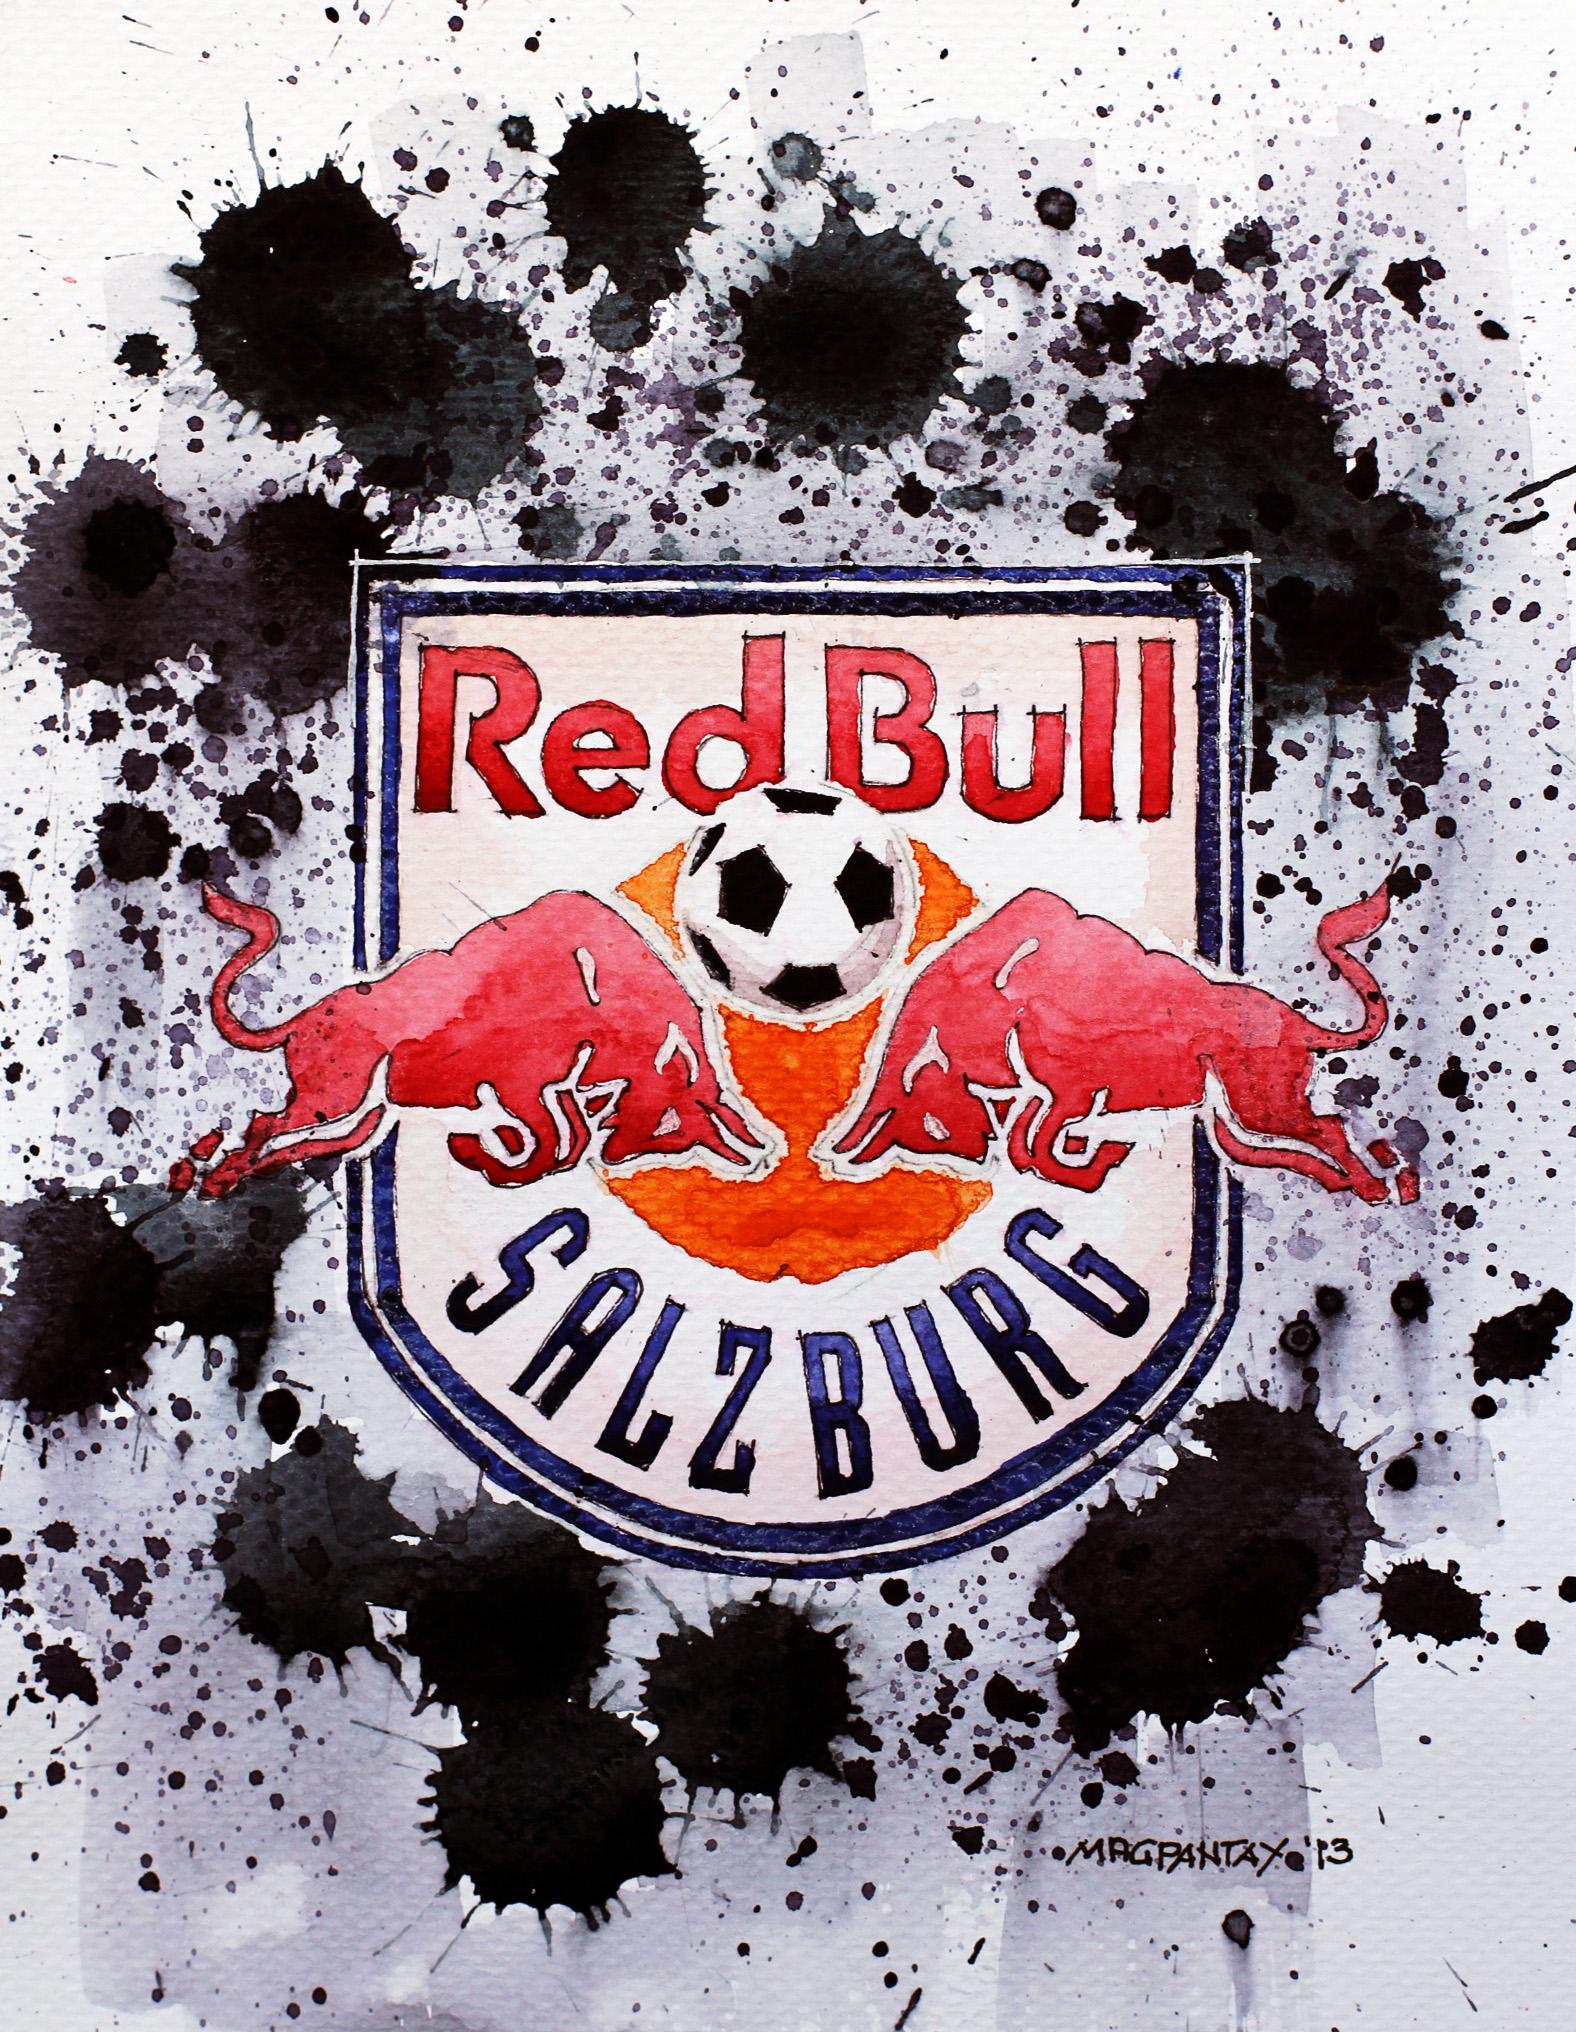 red bull salzburg austria wien